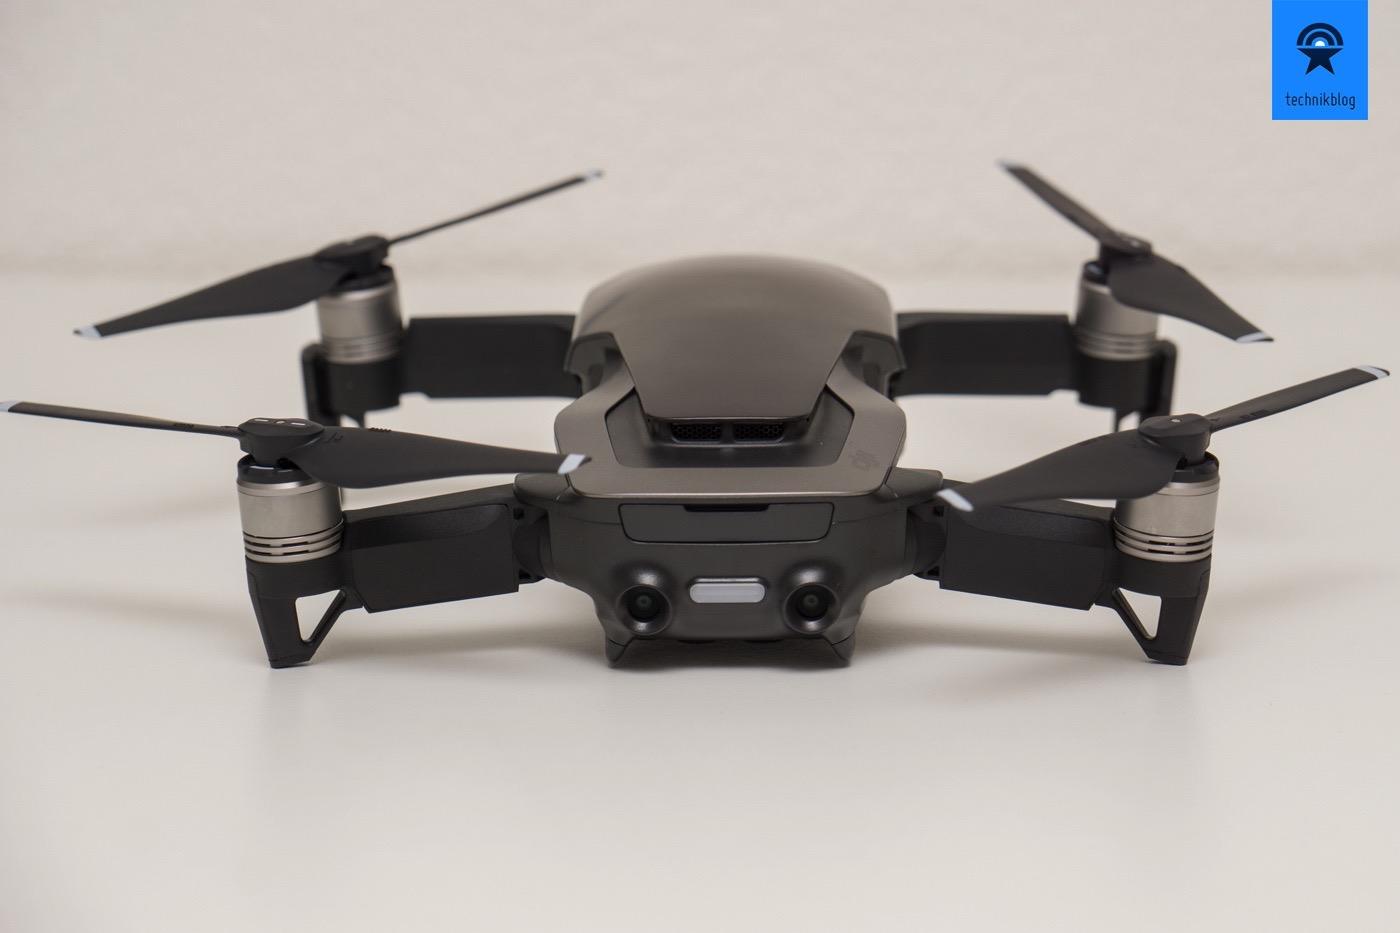 DJI Mavic Air: Sensoren auf der Rückseite